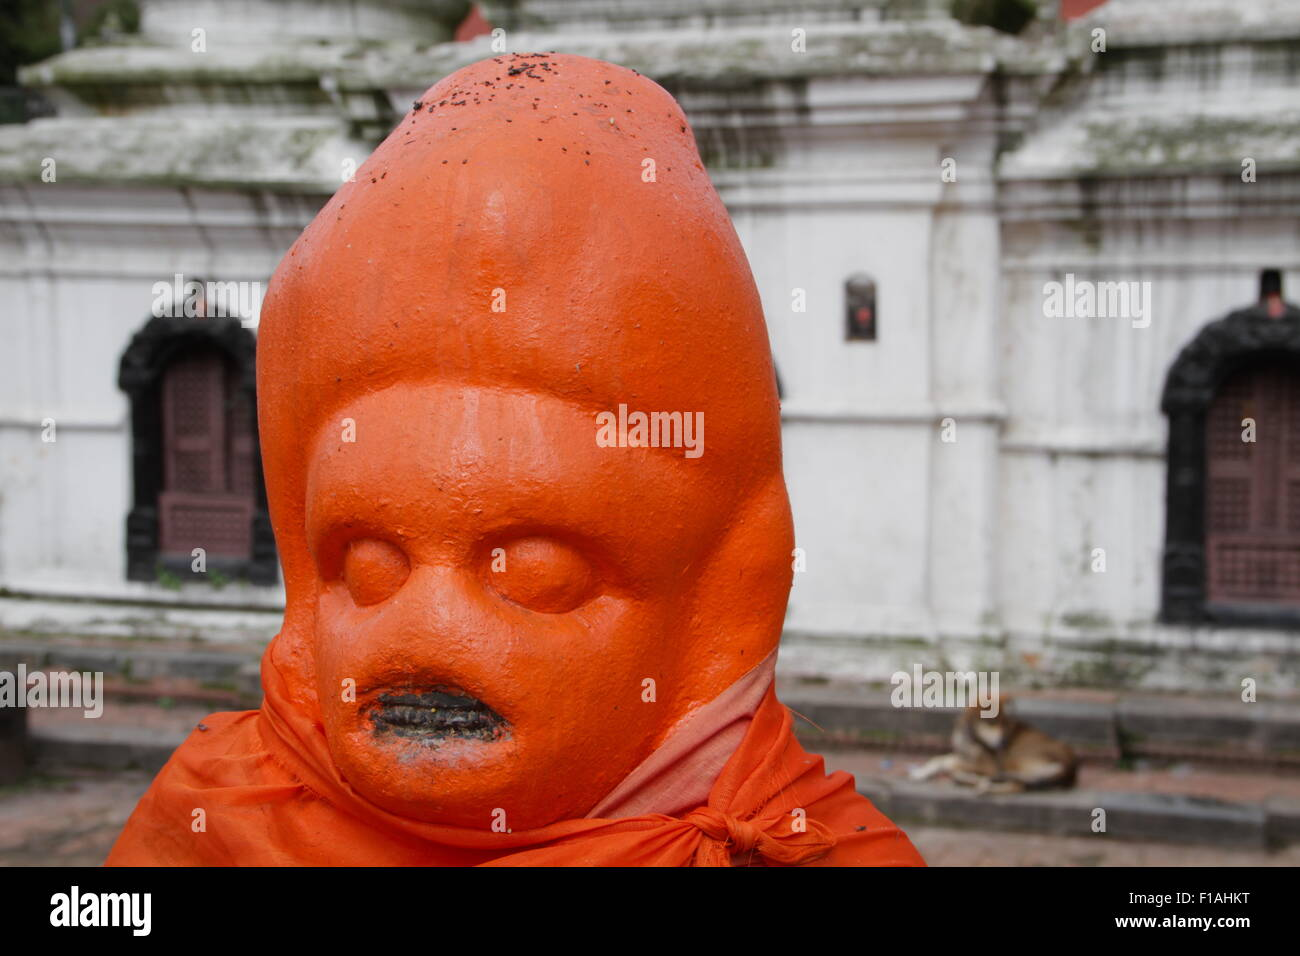 Hindu statue on the banks of Bagmati river at Pashupatinath Temple in Kathmandu - Stock Image